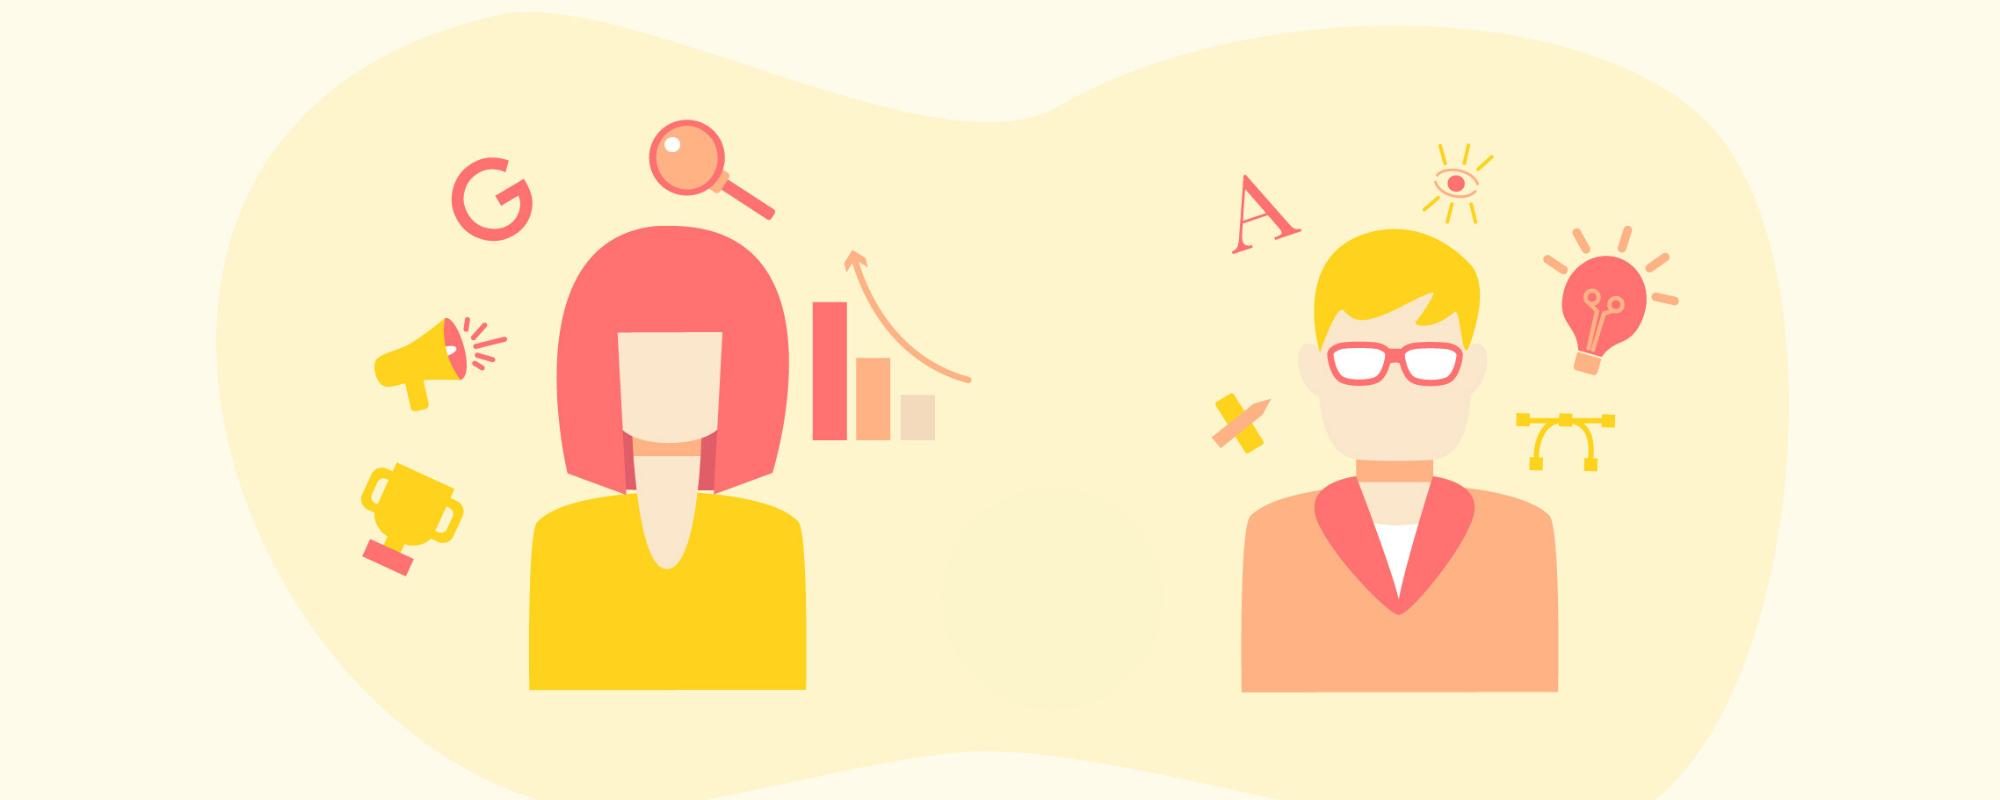 Digital Agency vs Creative Agency: How do they differ?